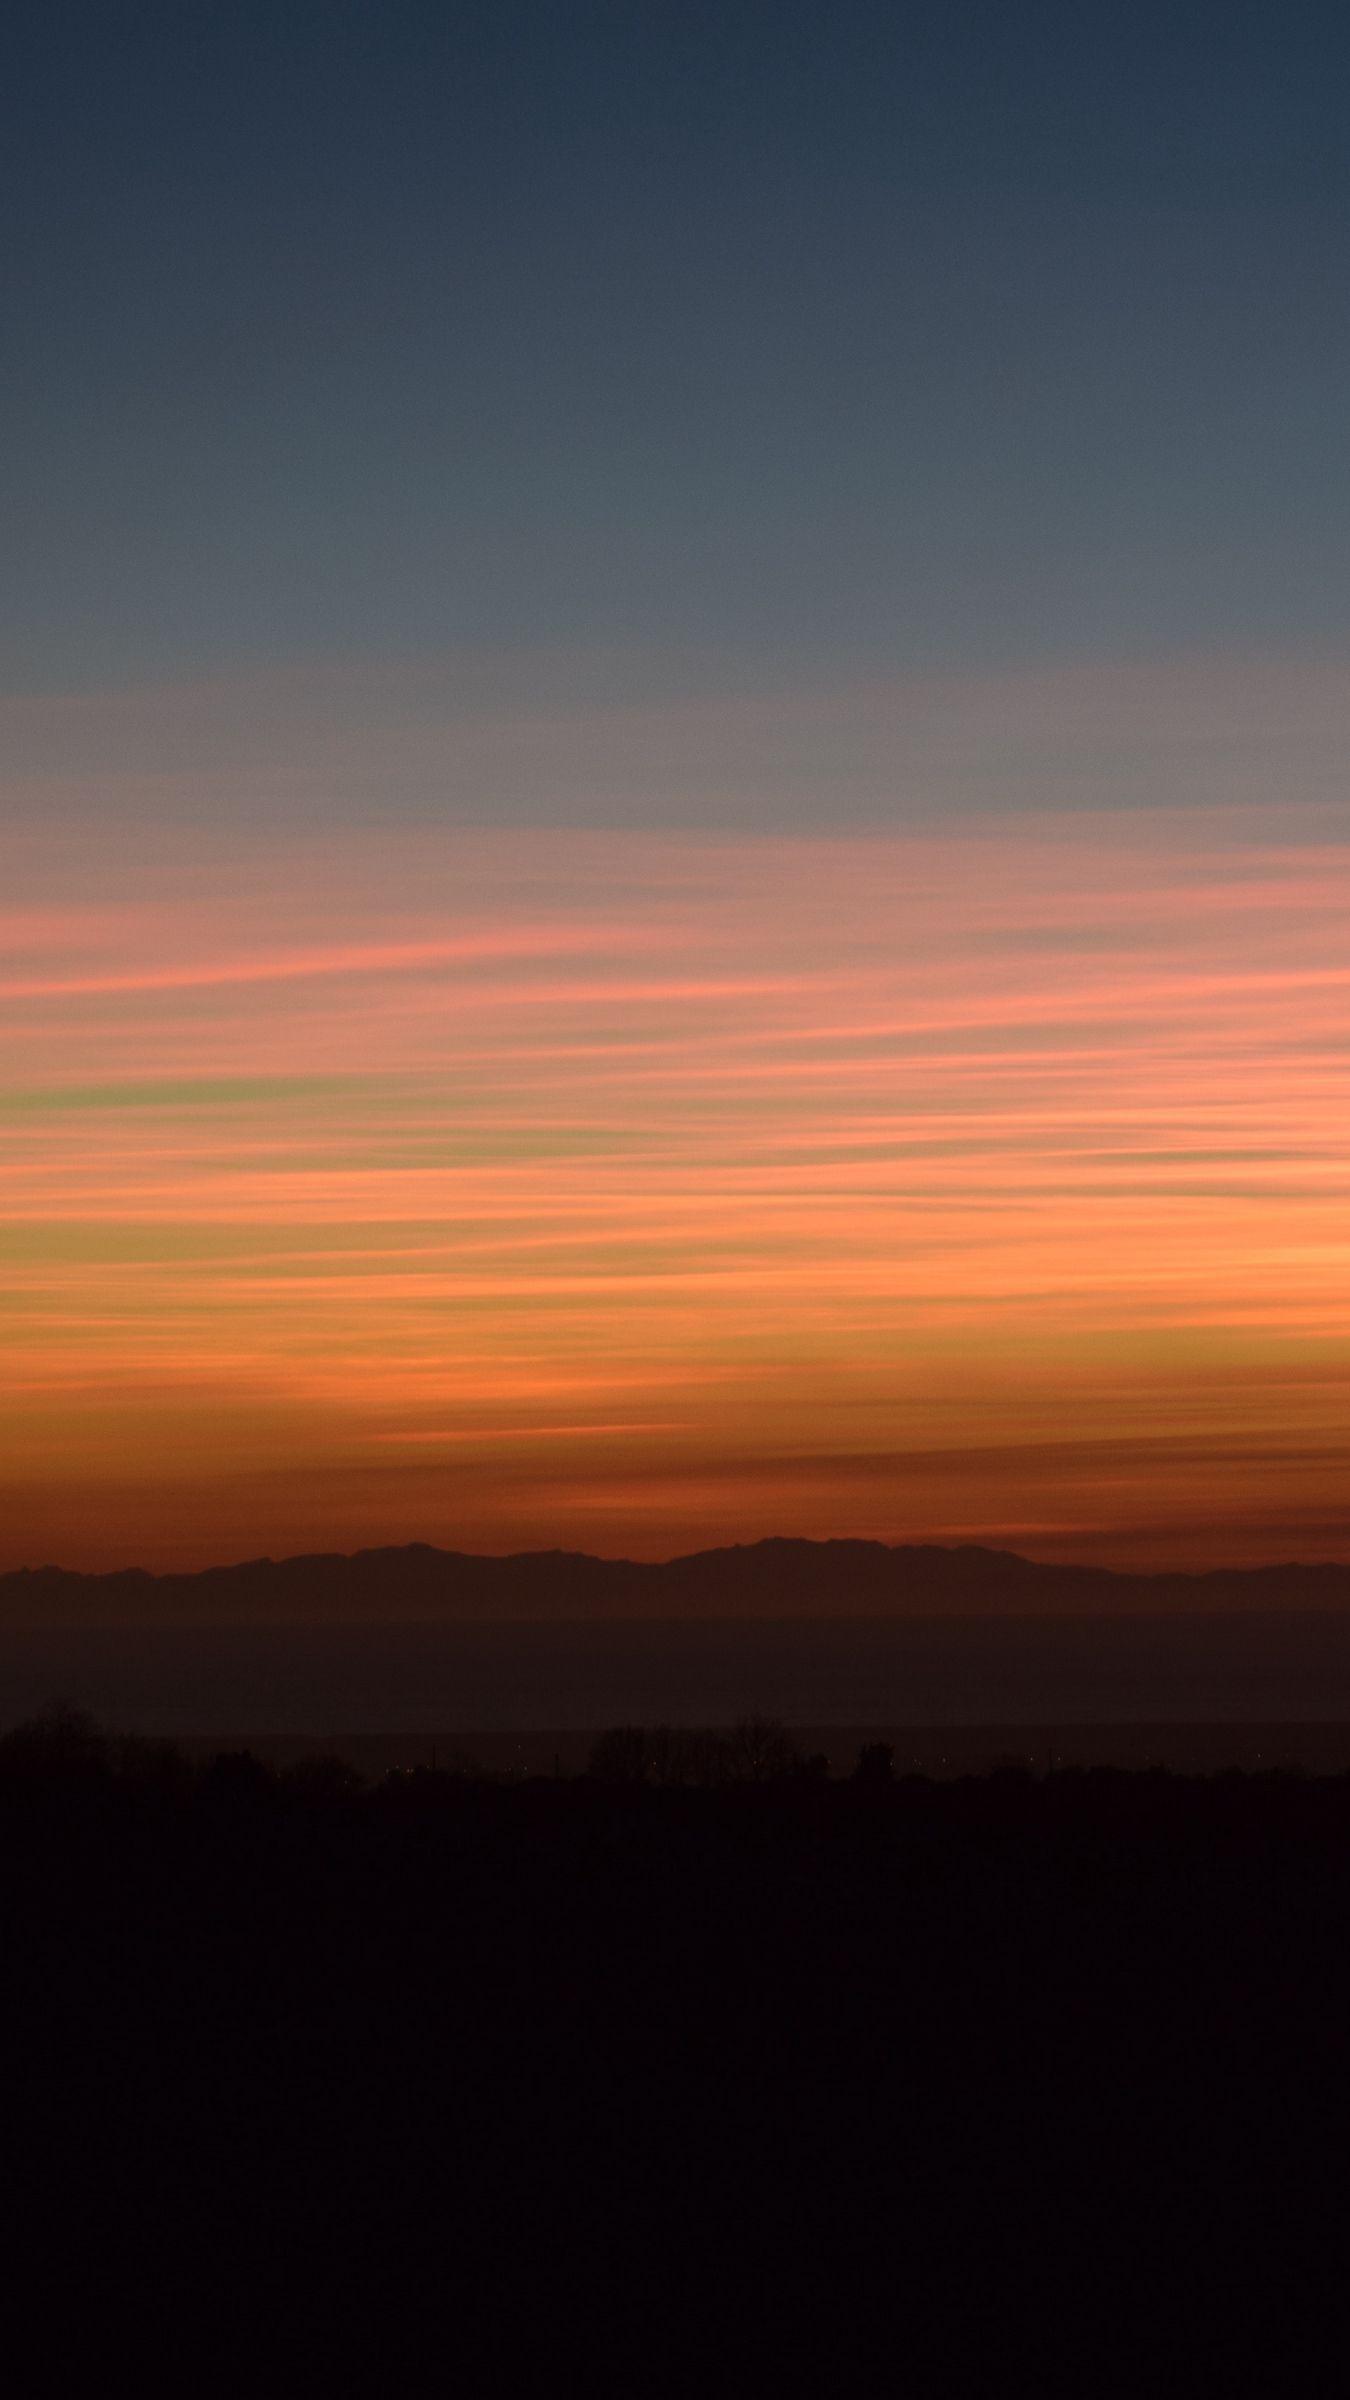 Clouds Horizon Sunset Landscape Wallpaper Sky Aesthetic Sunset Wallpaper Hd wallpaper sky clouds sunset dusk